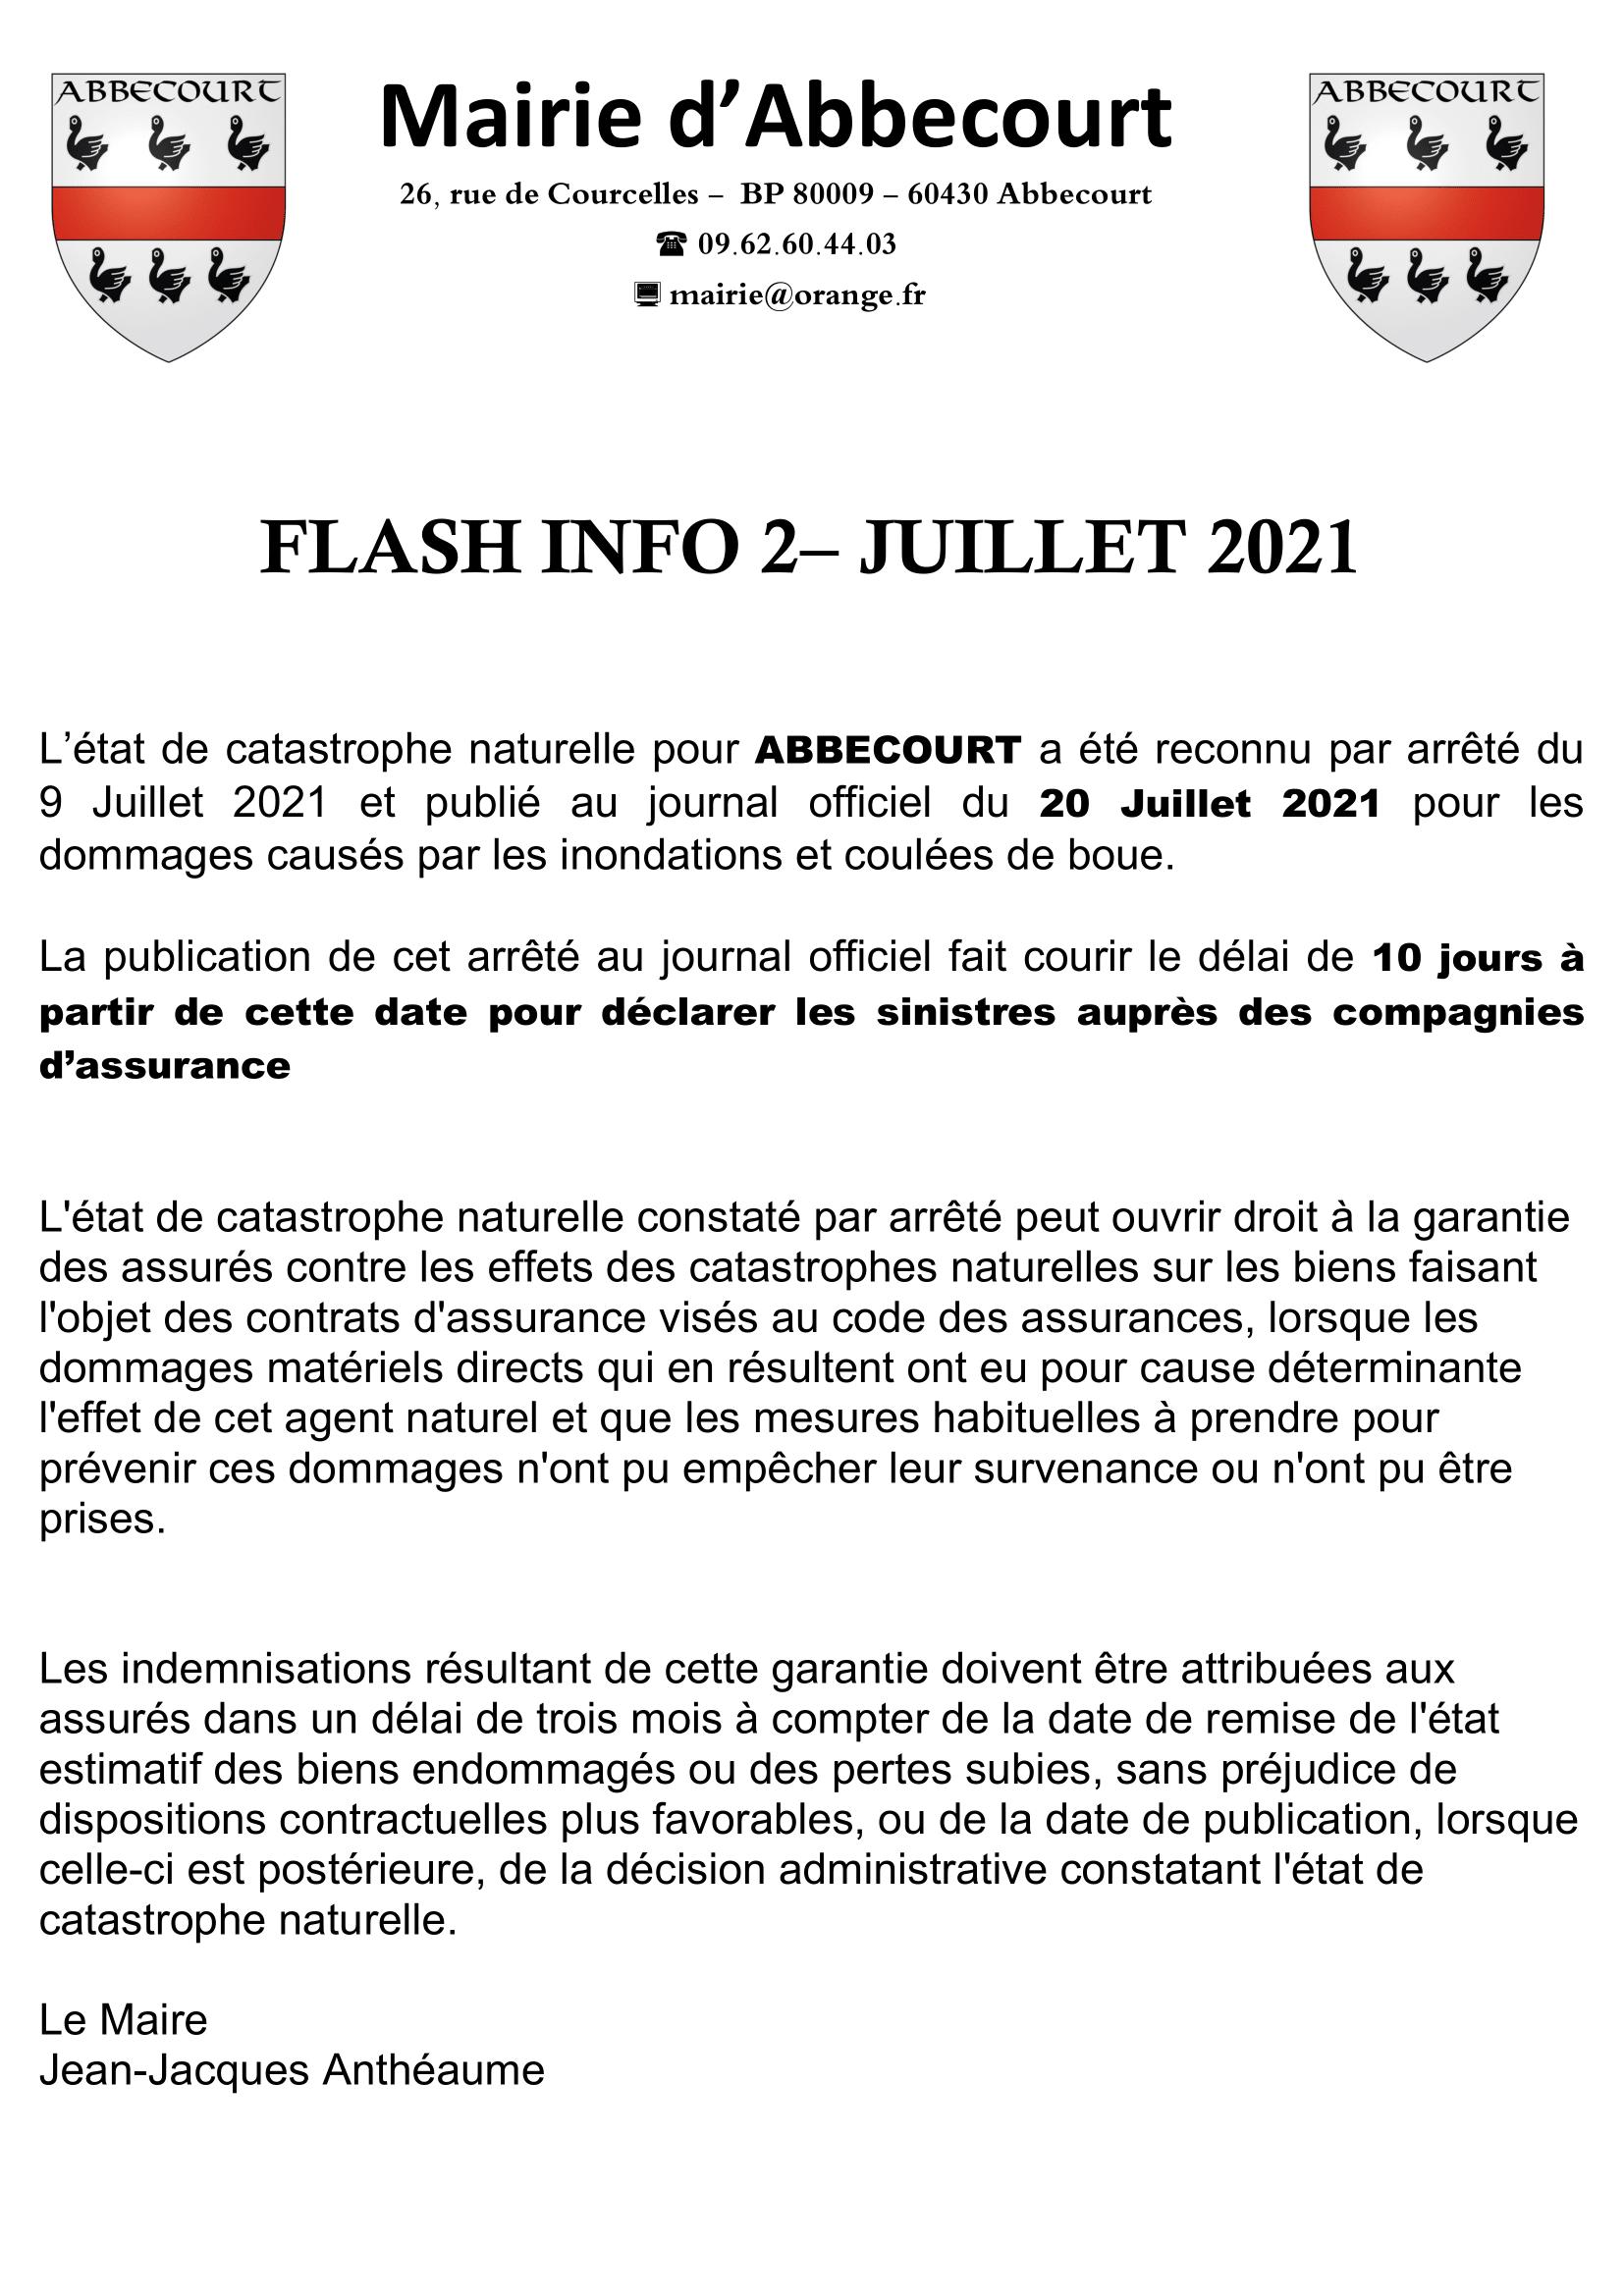 FLASH INFO 2 JUILLET 2021-1.png